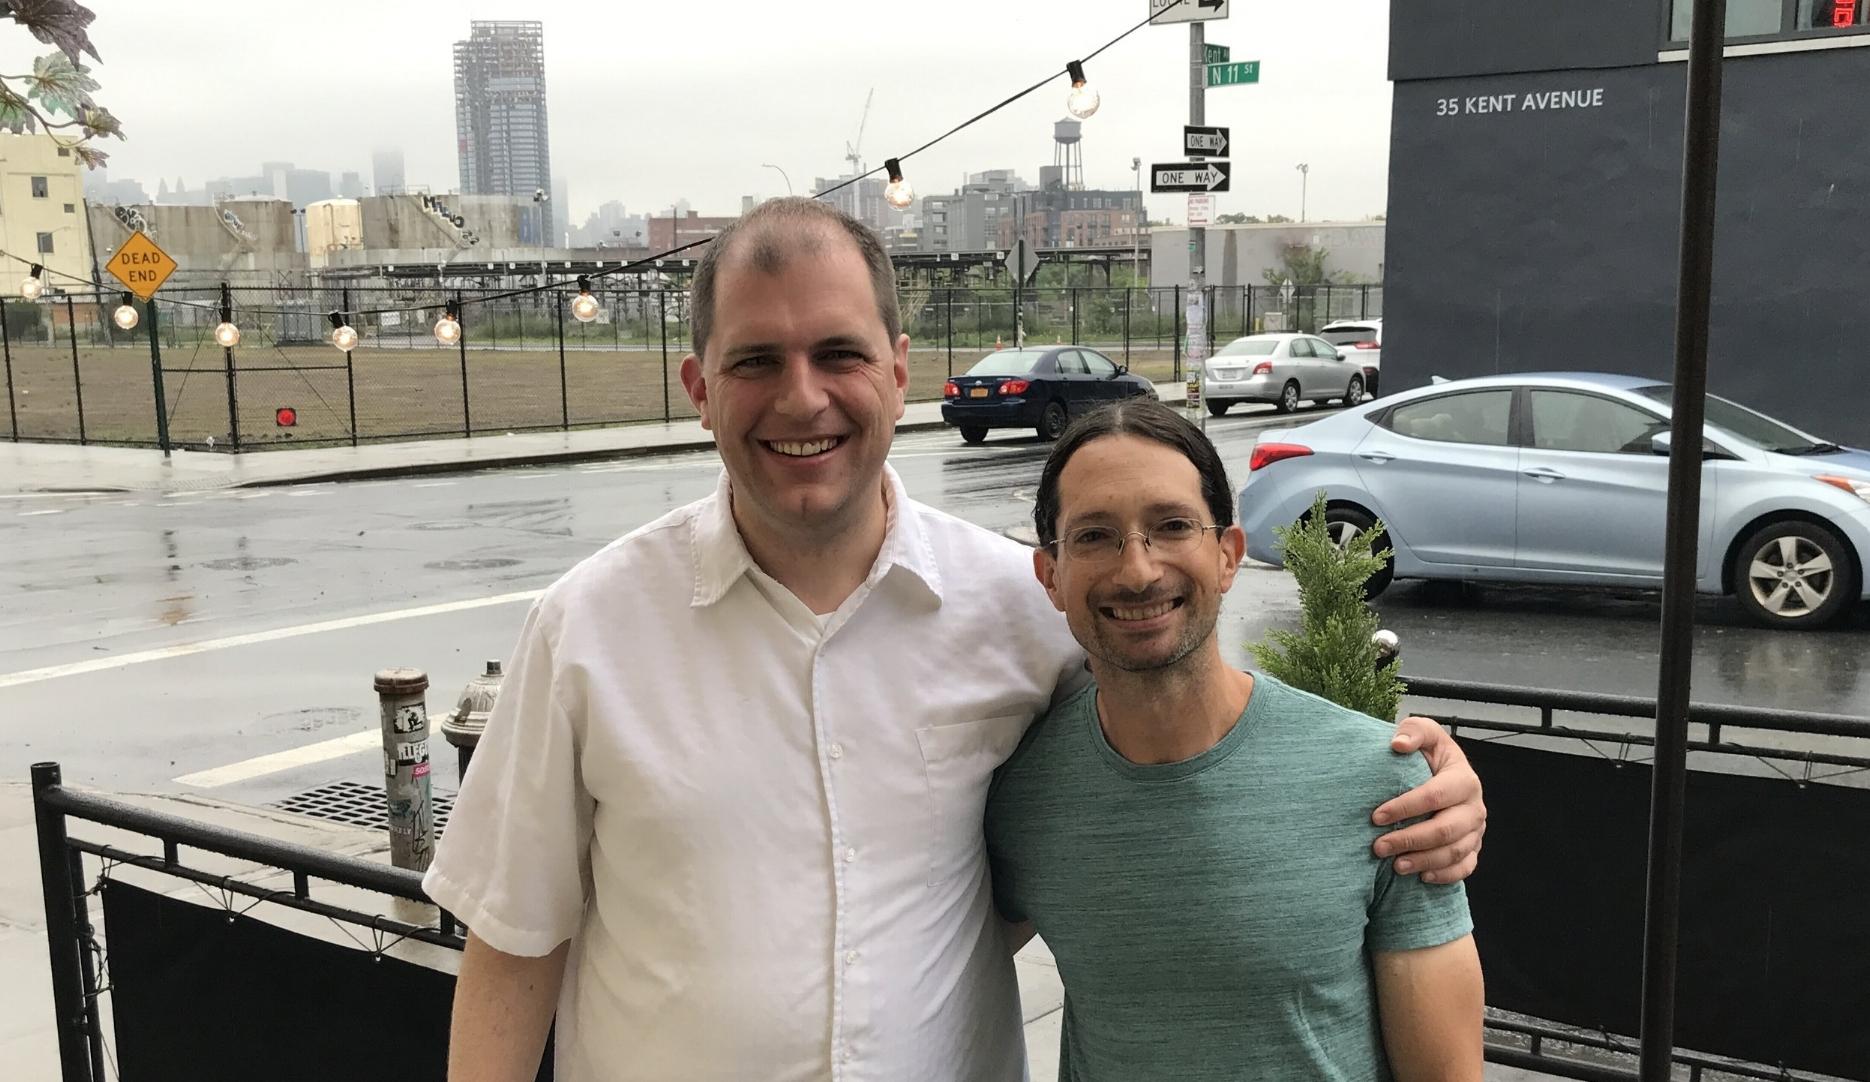 Music Director Jordan Randall Smith and Composer-in-Residence Ben Goldberg